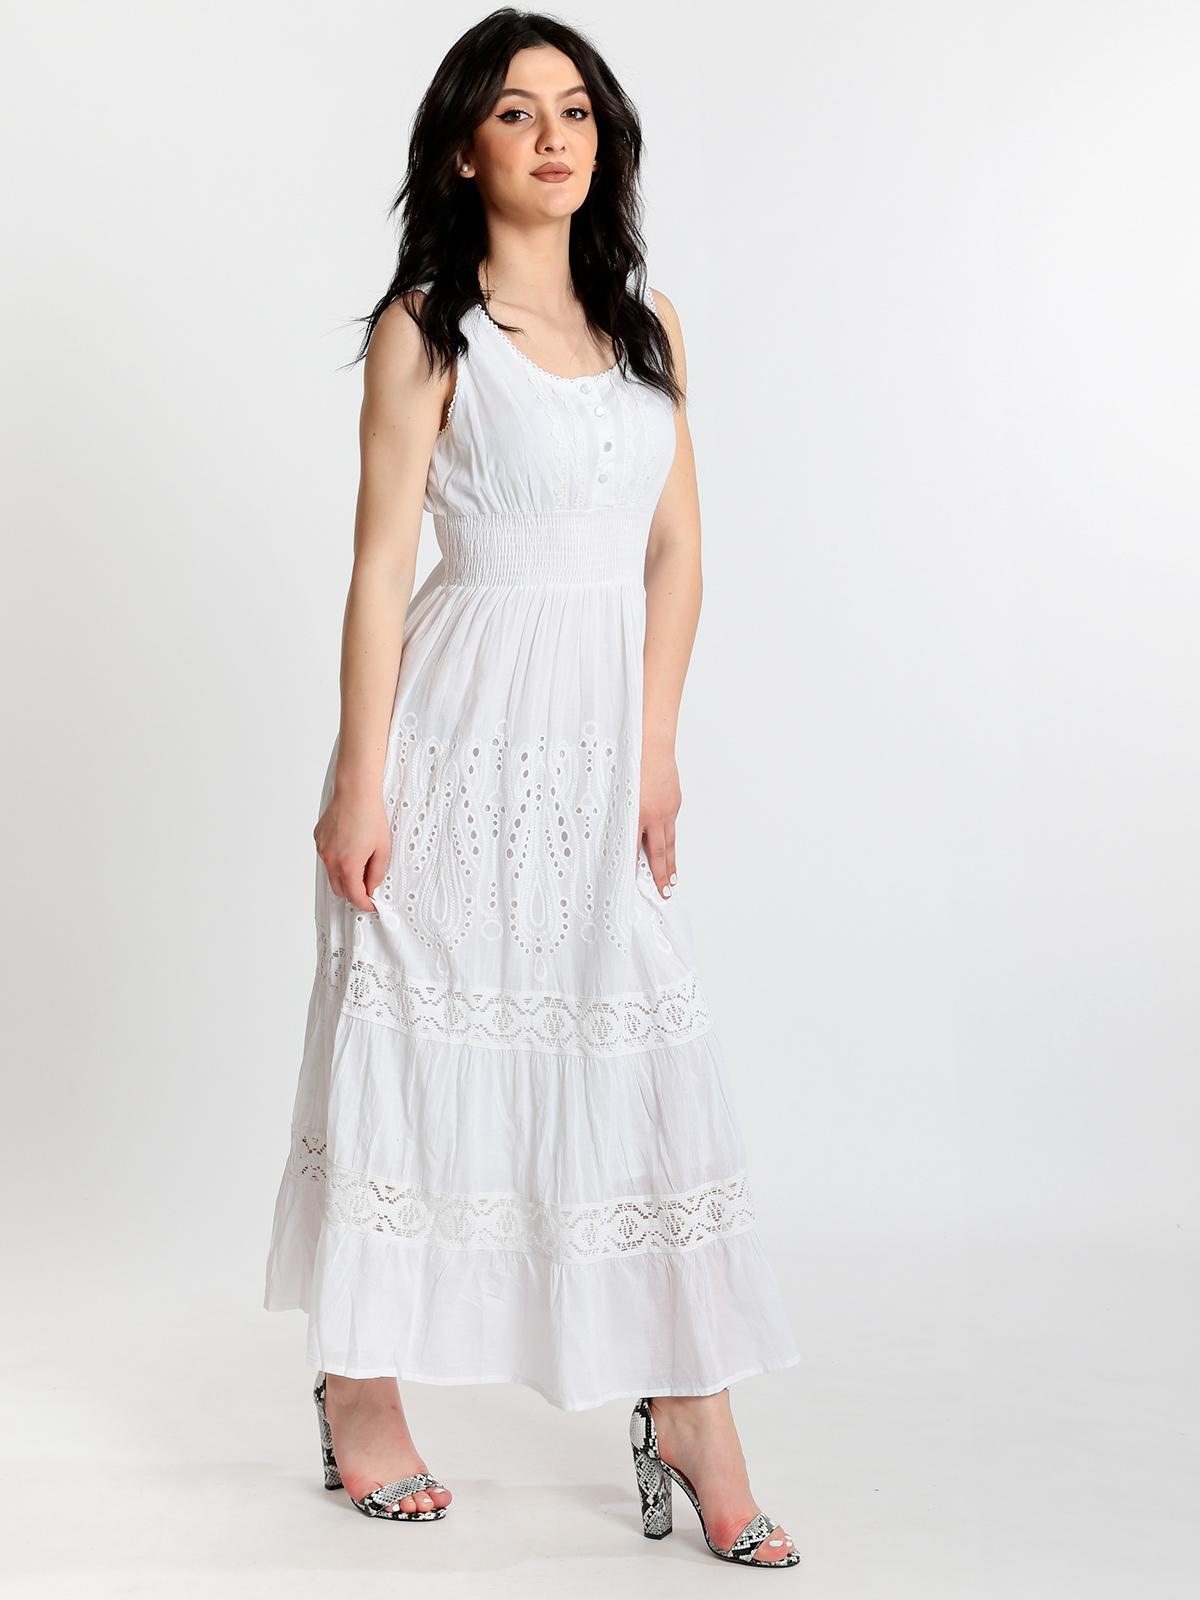 promo code 5f5d4 32d43 Vestito lungo in cotone indian emporium | MecShopping